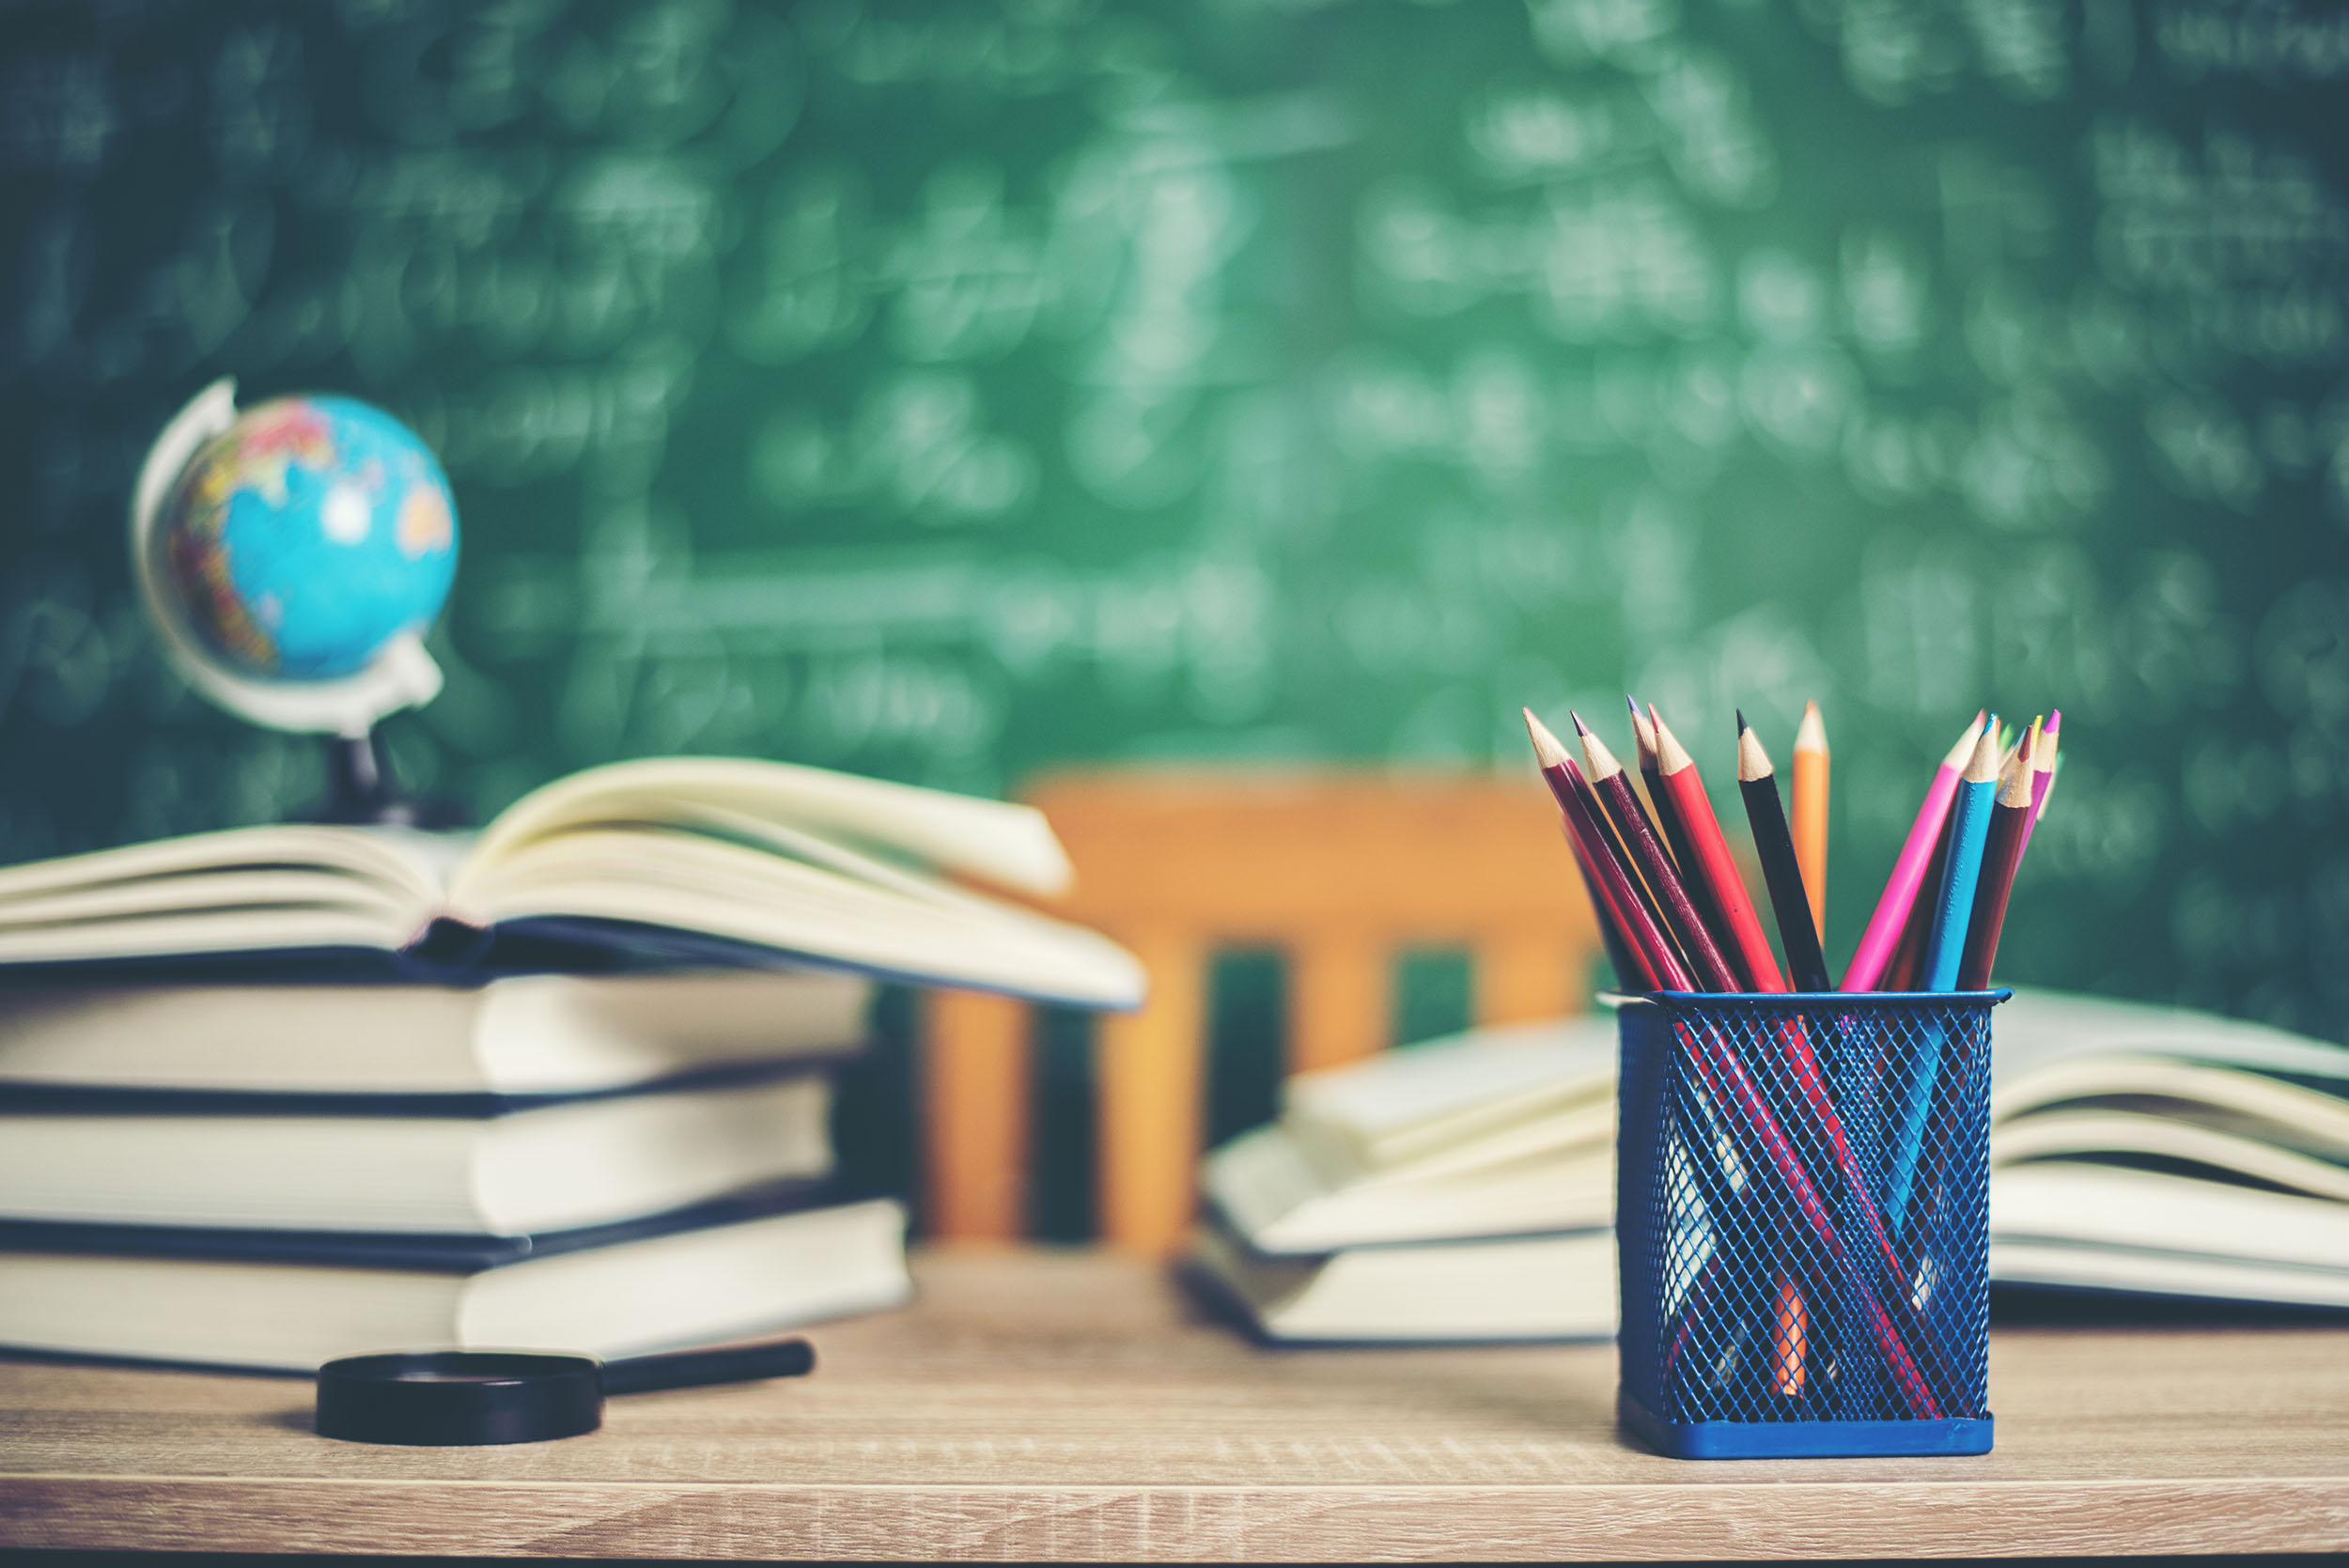 How to สอนยังไงให้เด็กไม่หลับ เทคนิคที่ผู้สอนต้องรู้